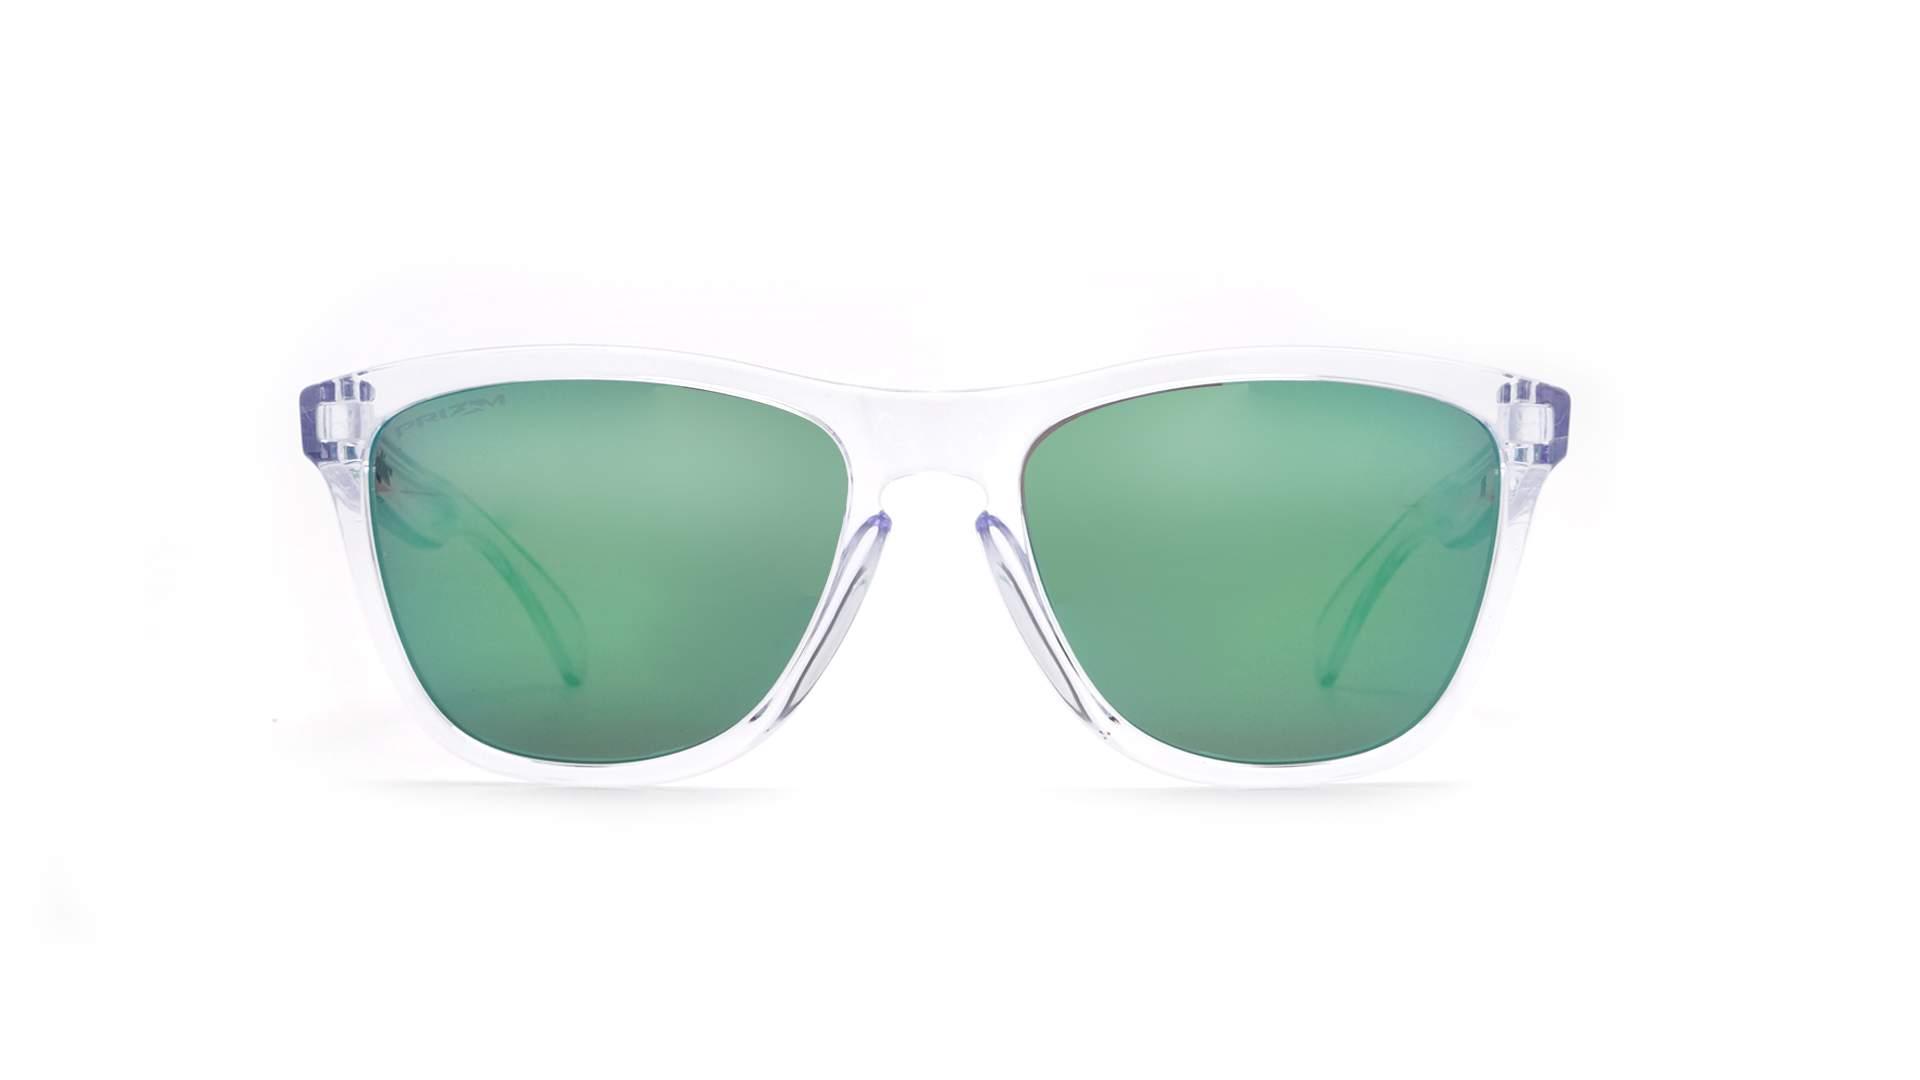 1ebef5d04 Sunglasses Oakley Frogskins Crystal clear Clear Prizm OO9013 D6 55-17  Medium Mirror